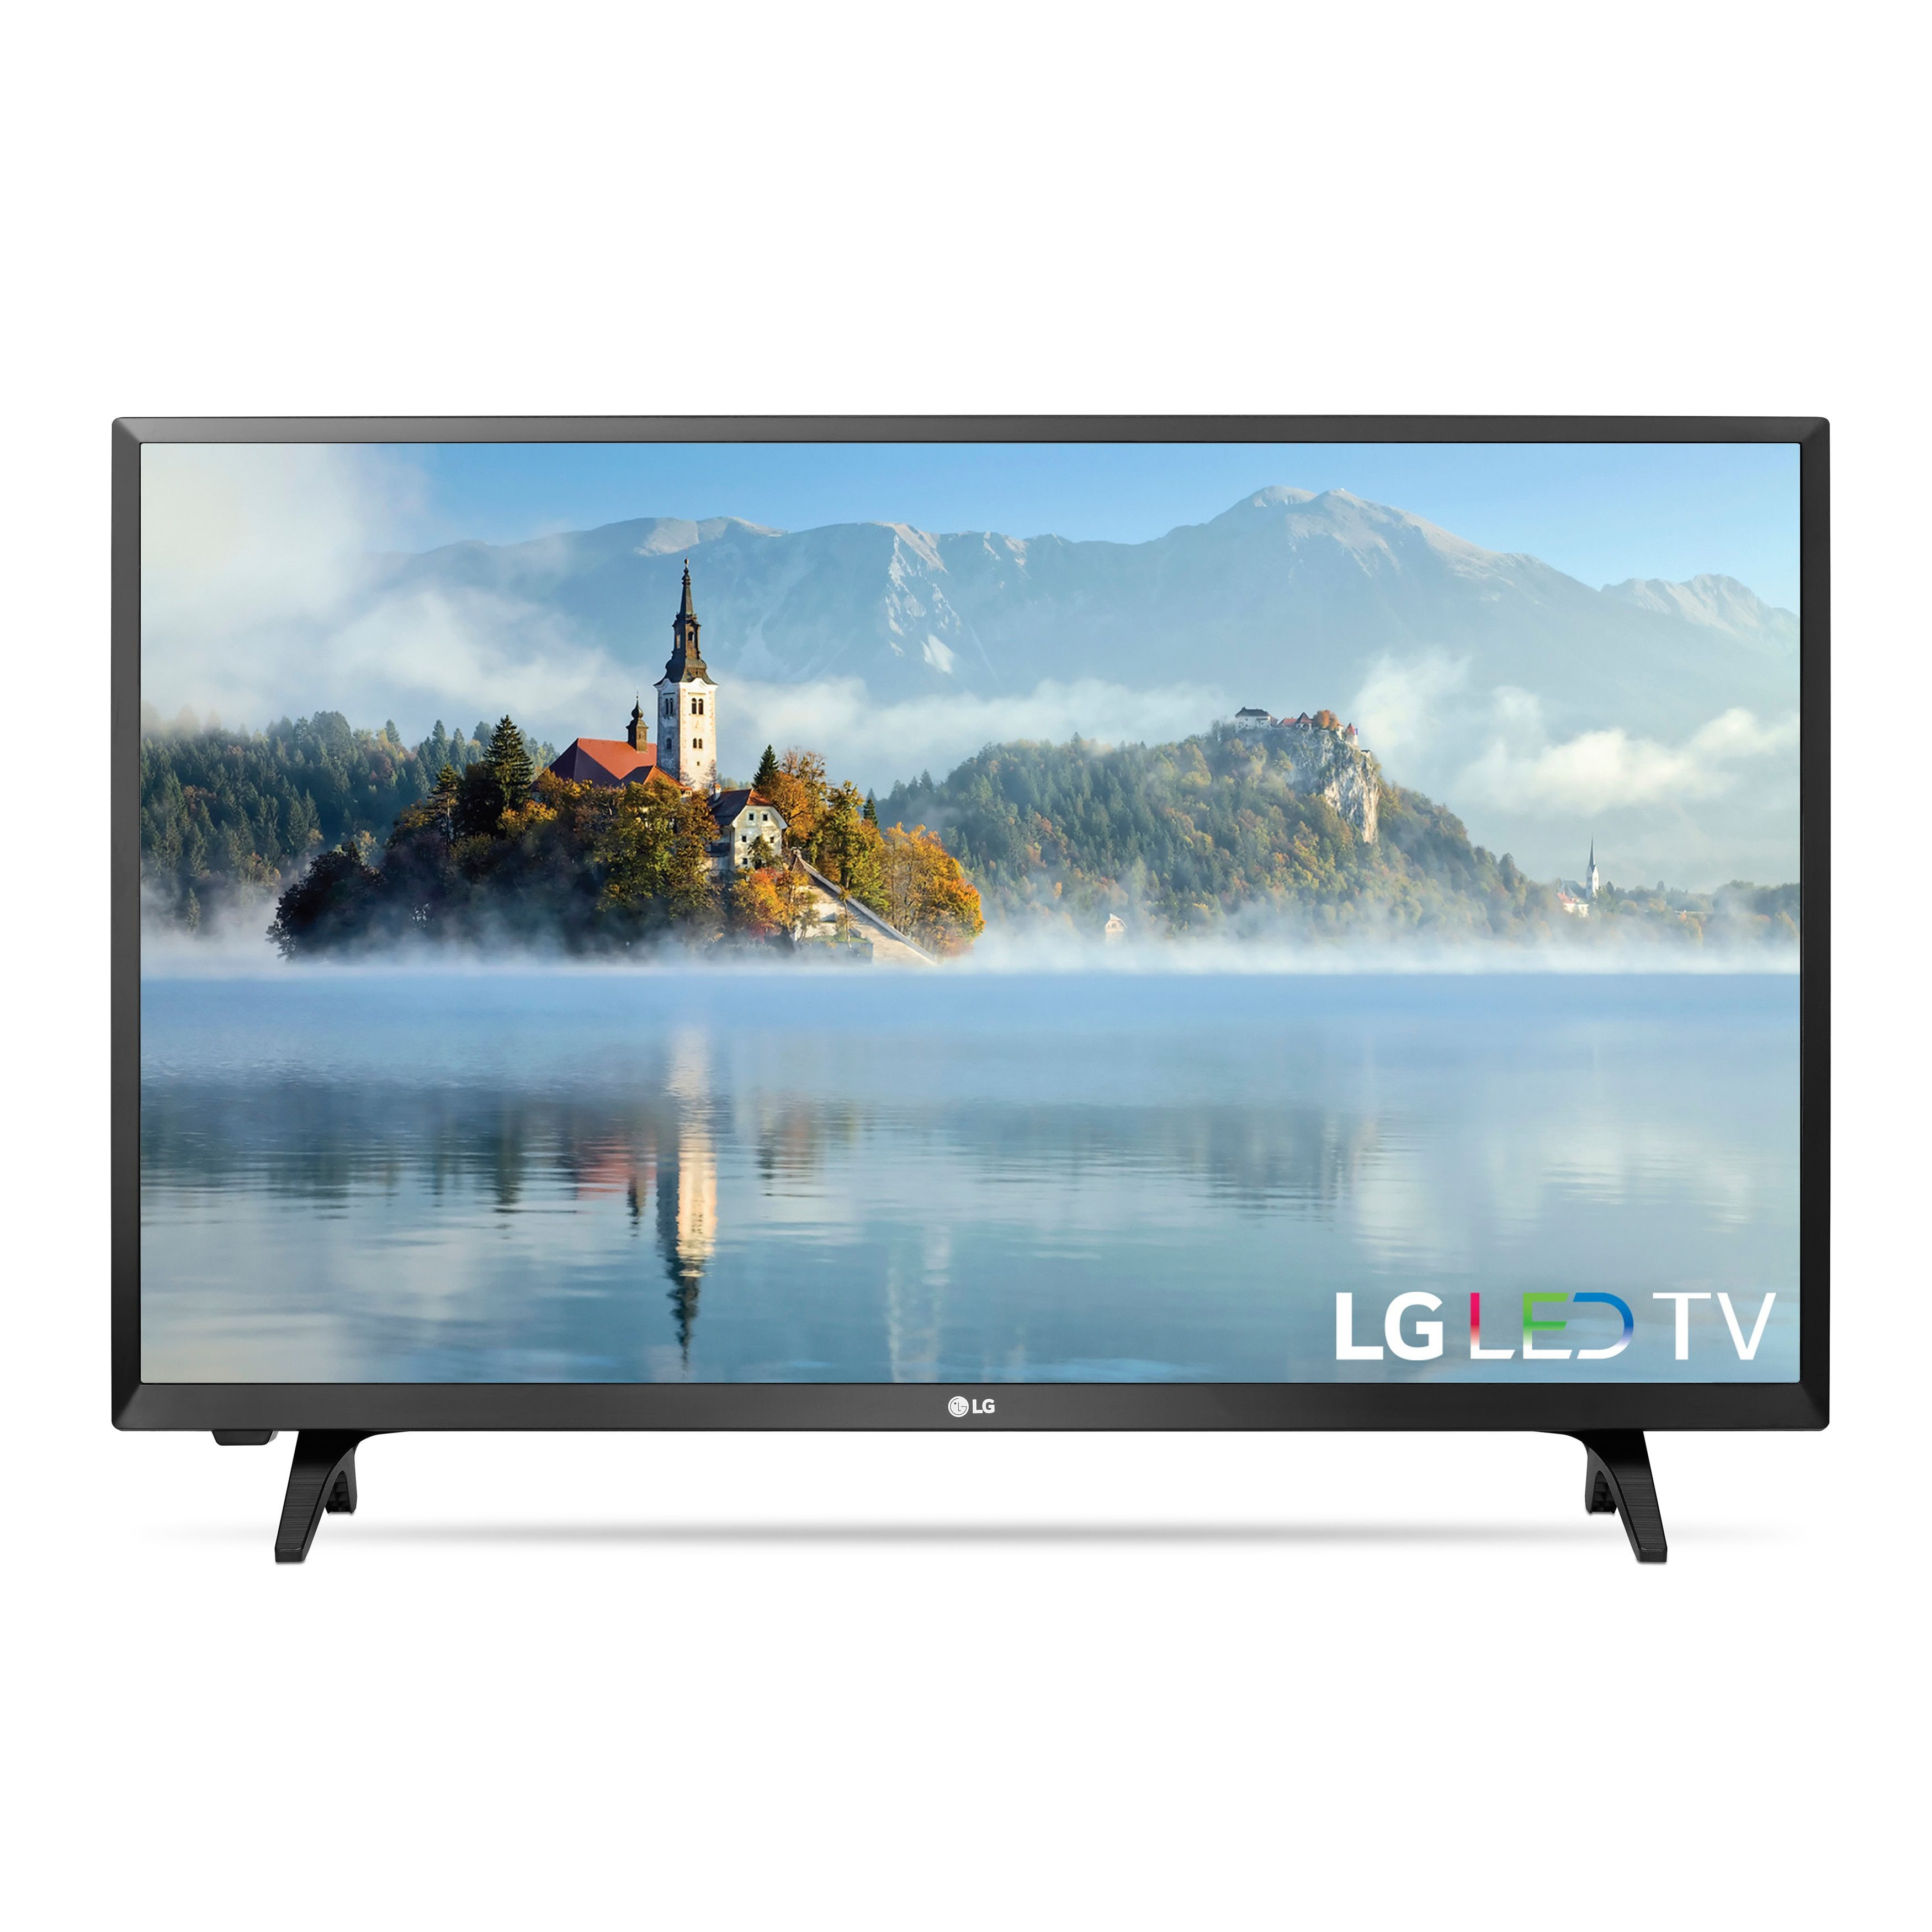 LG 32-inch Class LED 32LJ500B Television, Black In 2019